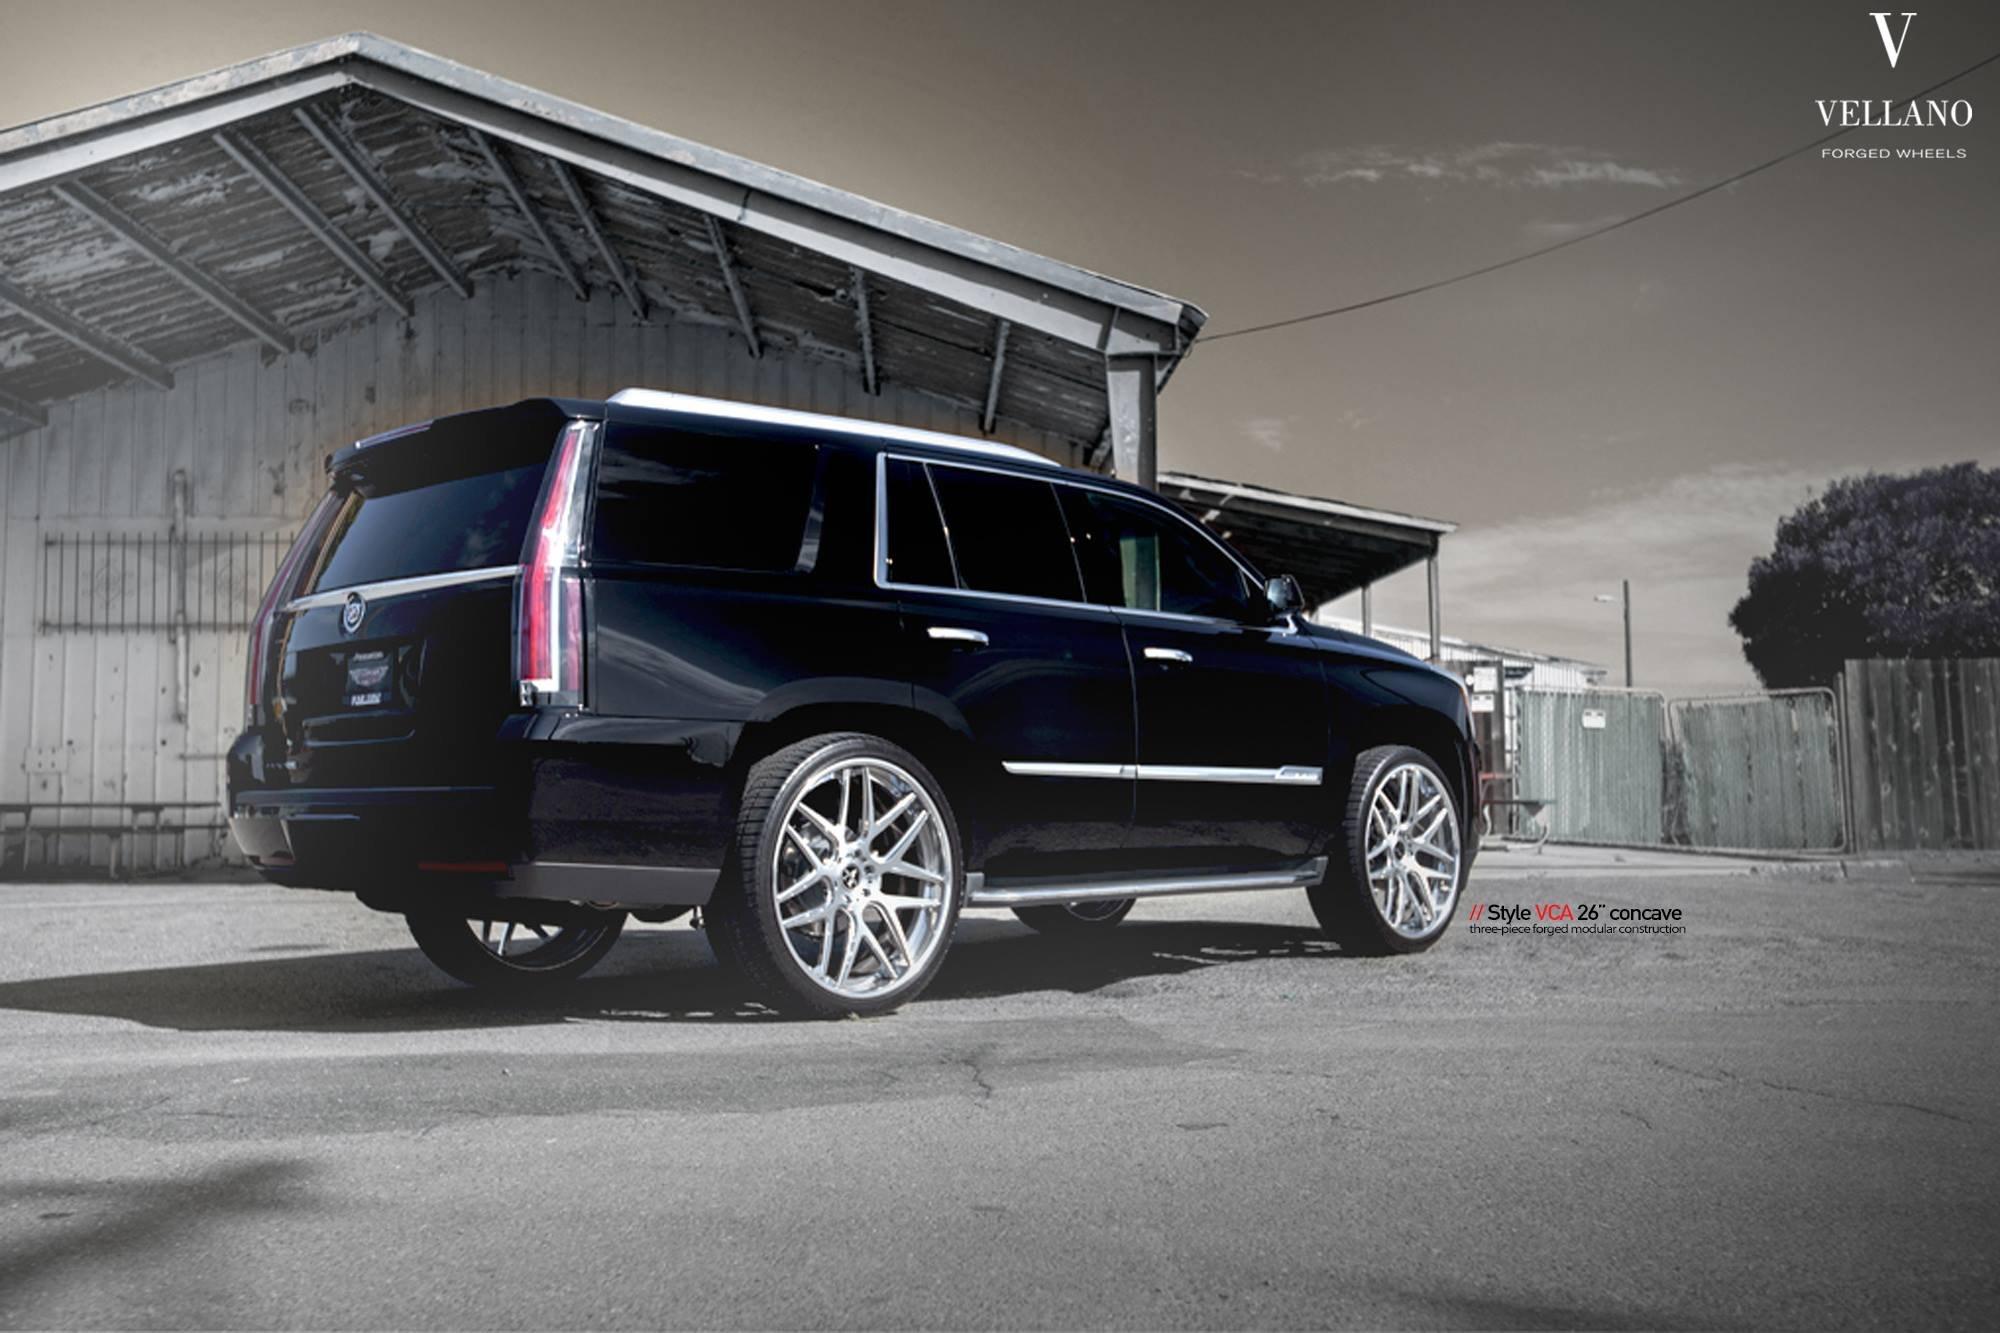 Ultimate SUV: Black Cadillac Escalade Put on 26 Inch Vellano Wheels